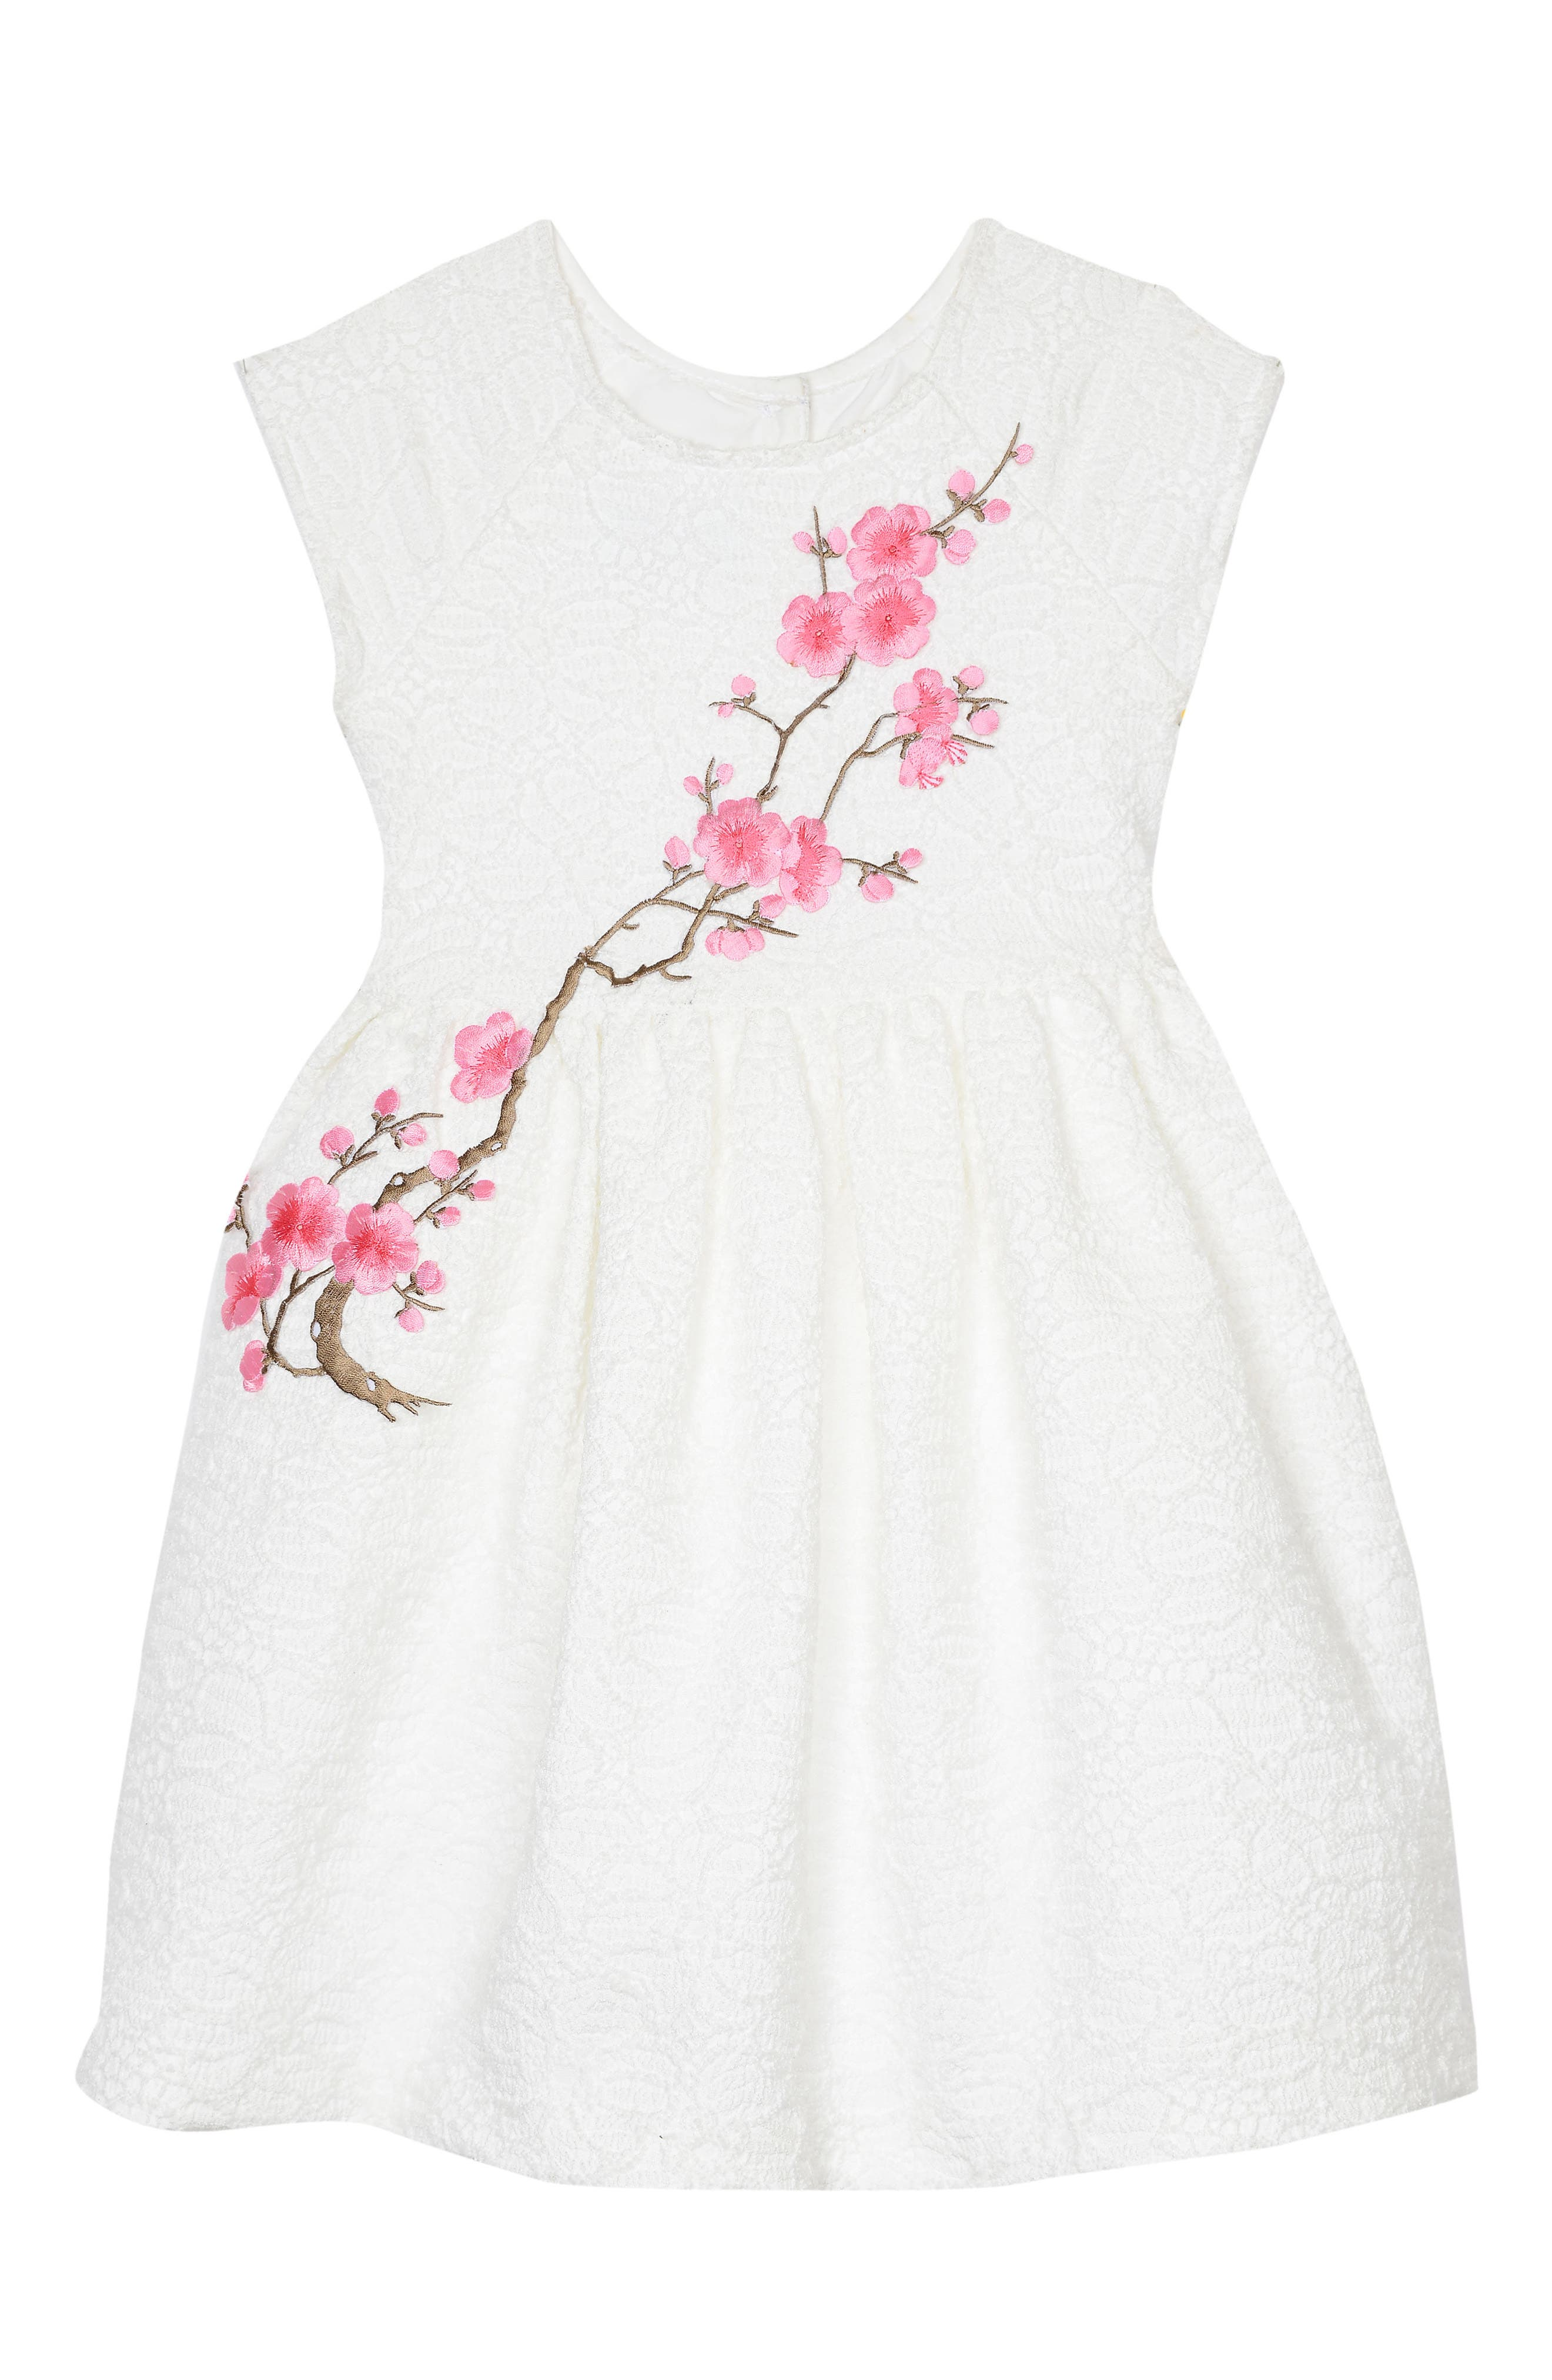 Main Image - Pippa & Julie Cherry Blossom Dress (Baby Girls)